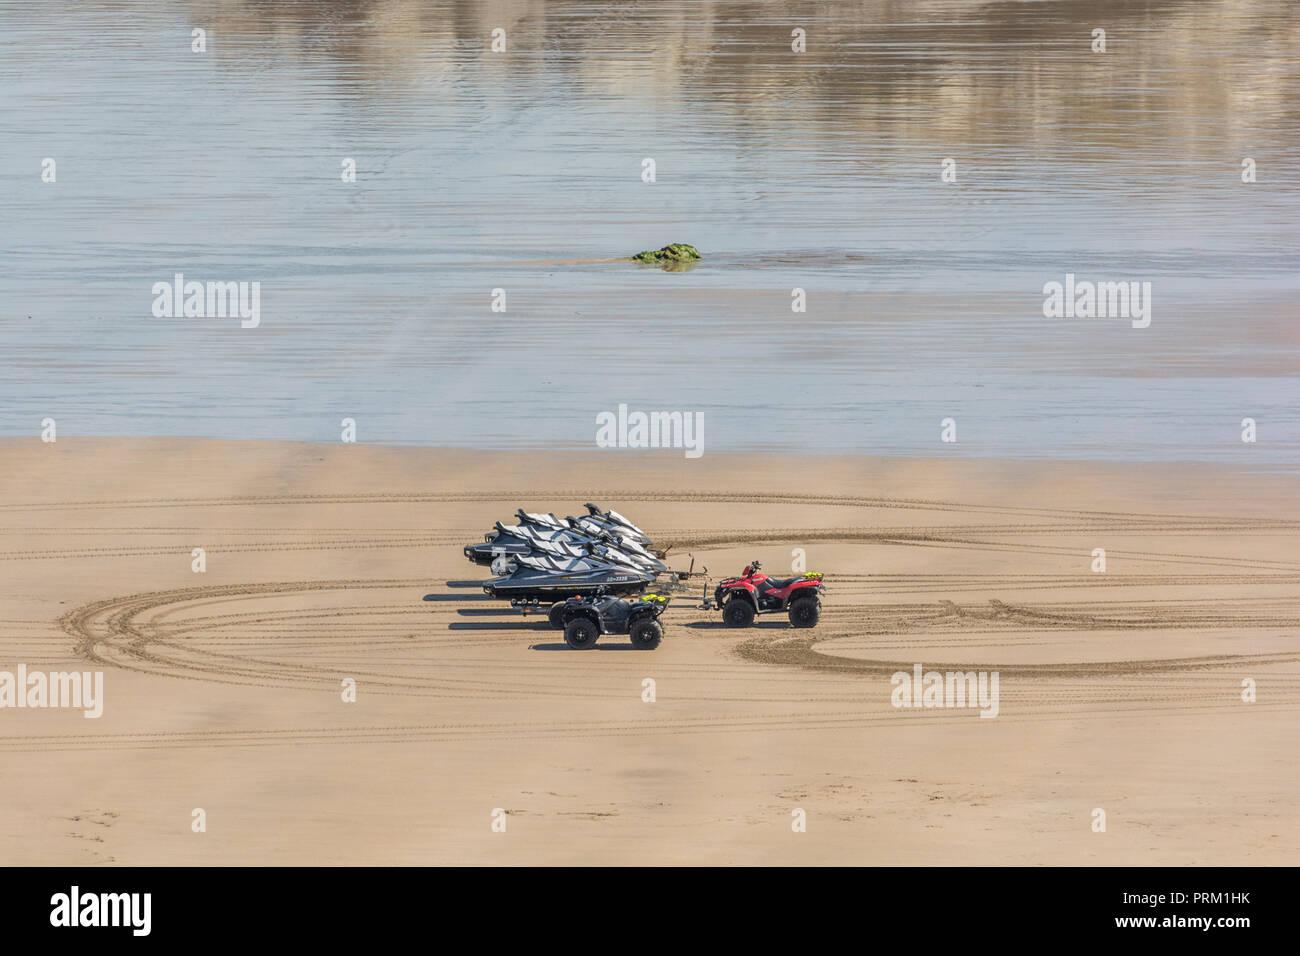 Seaside Holidays Metaphor Imágenes De Stock   Seaside Holidays ... abb9751b2b898